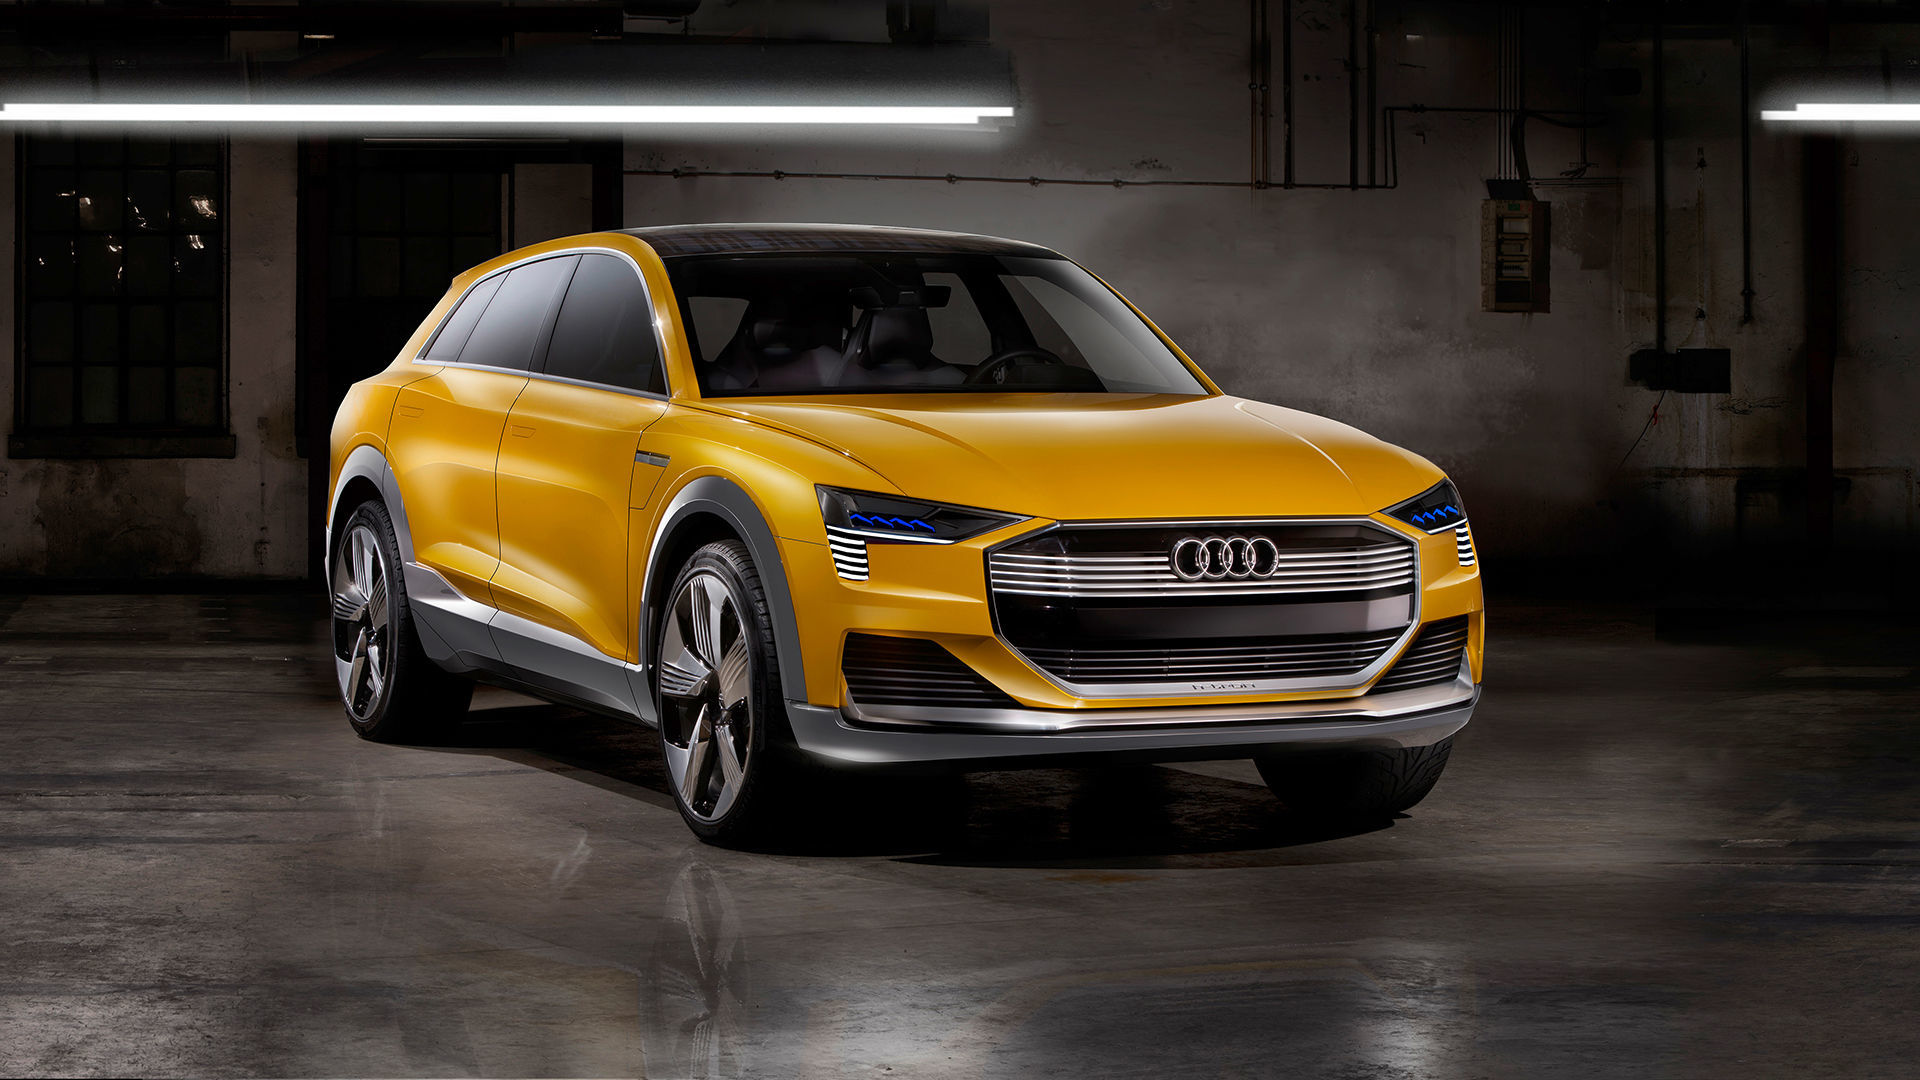 Toyota Company Latest Models >> The Audi h-tron quattro concept | Audi MediaCenter